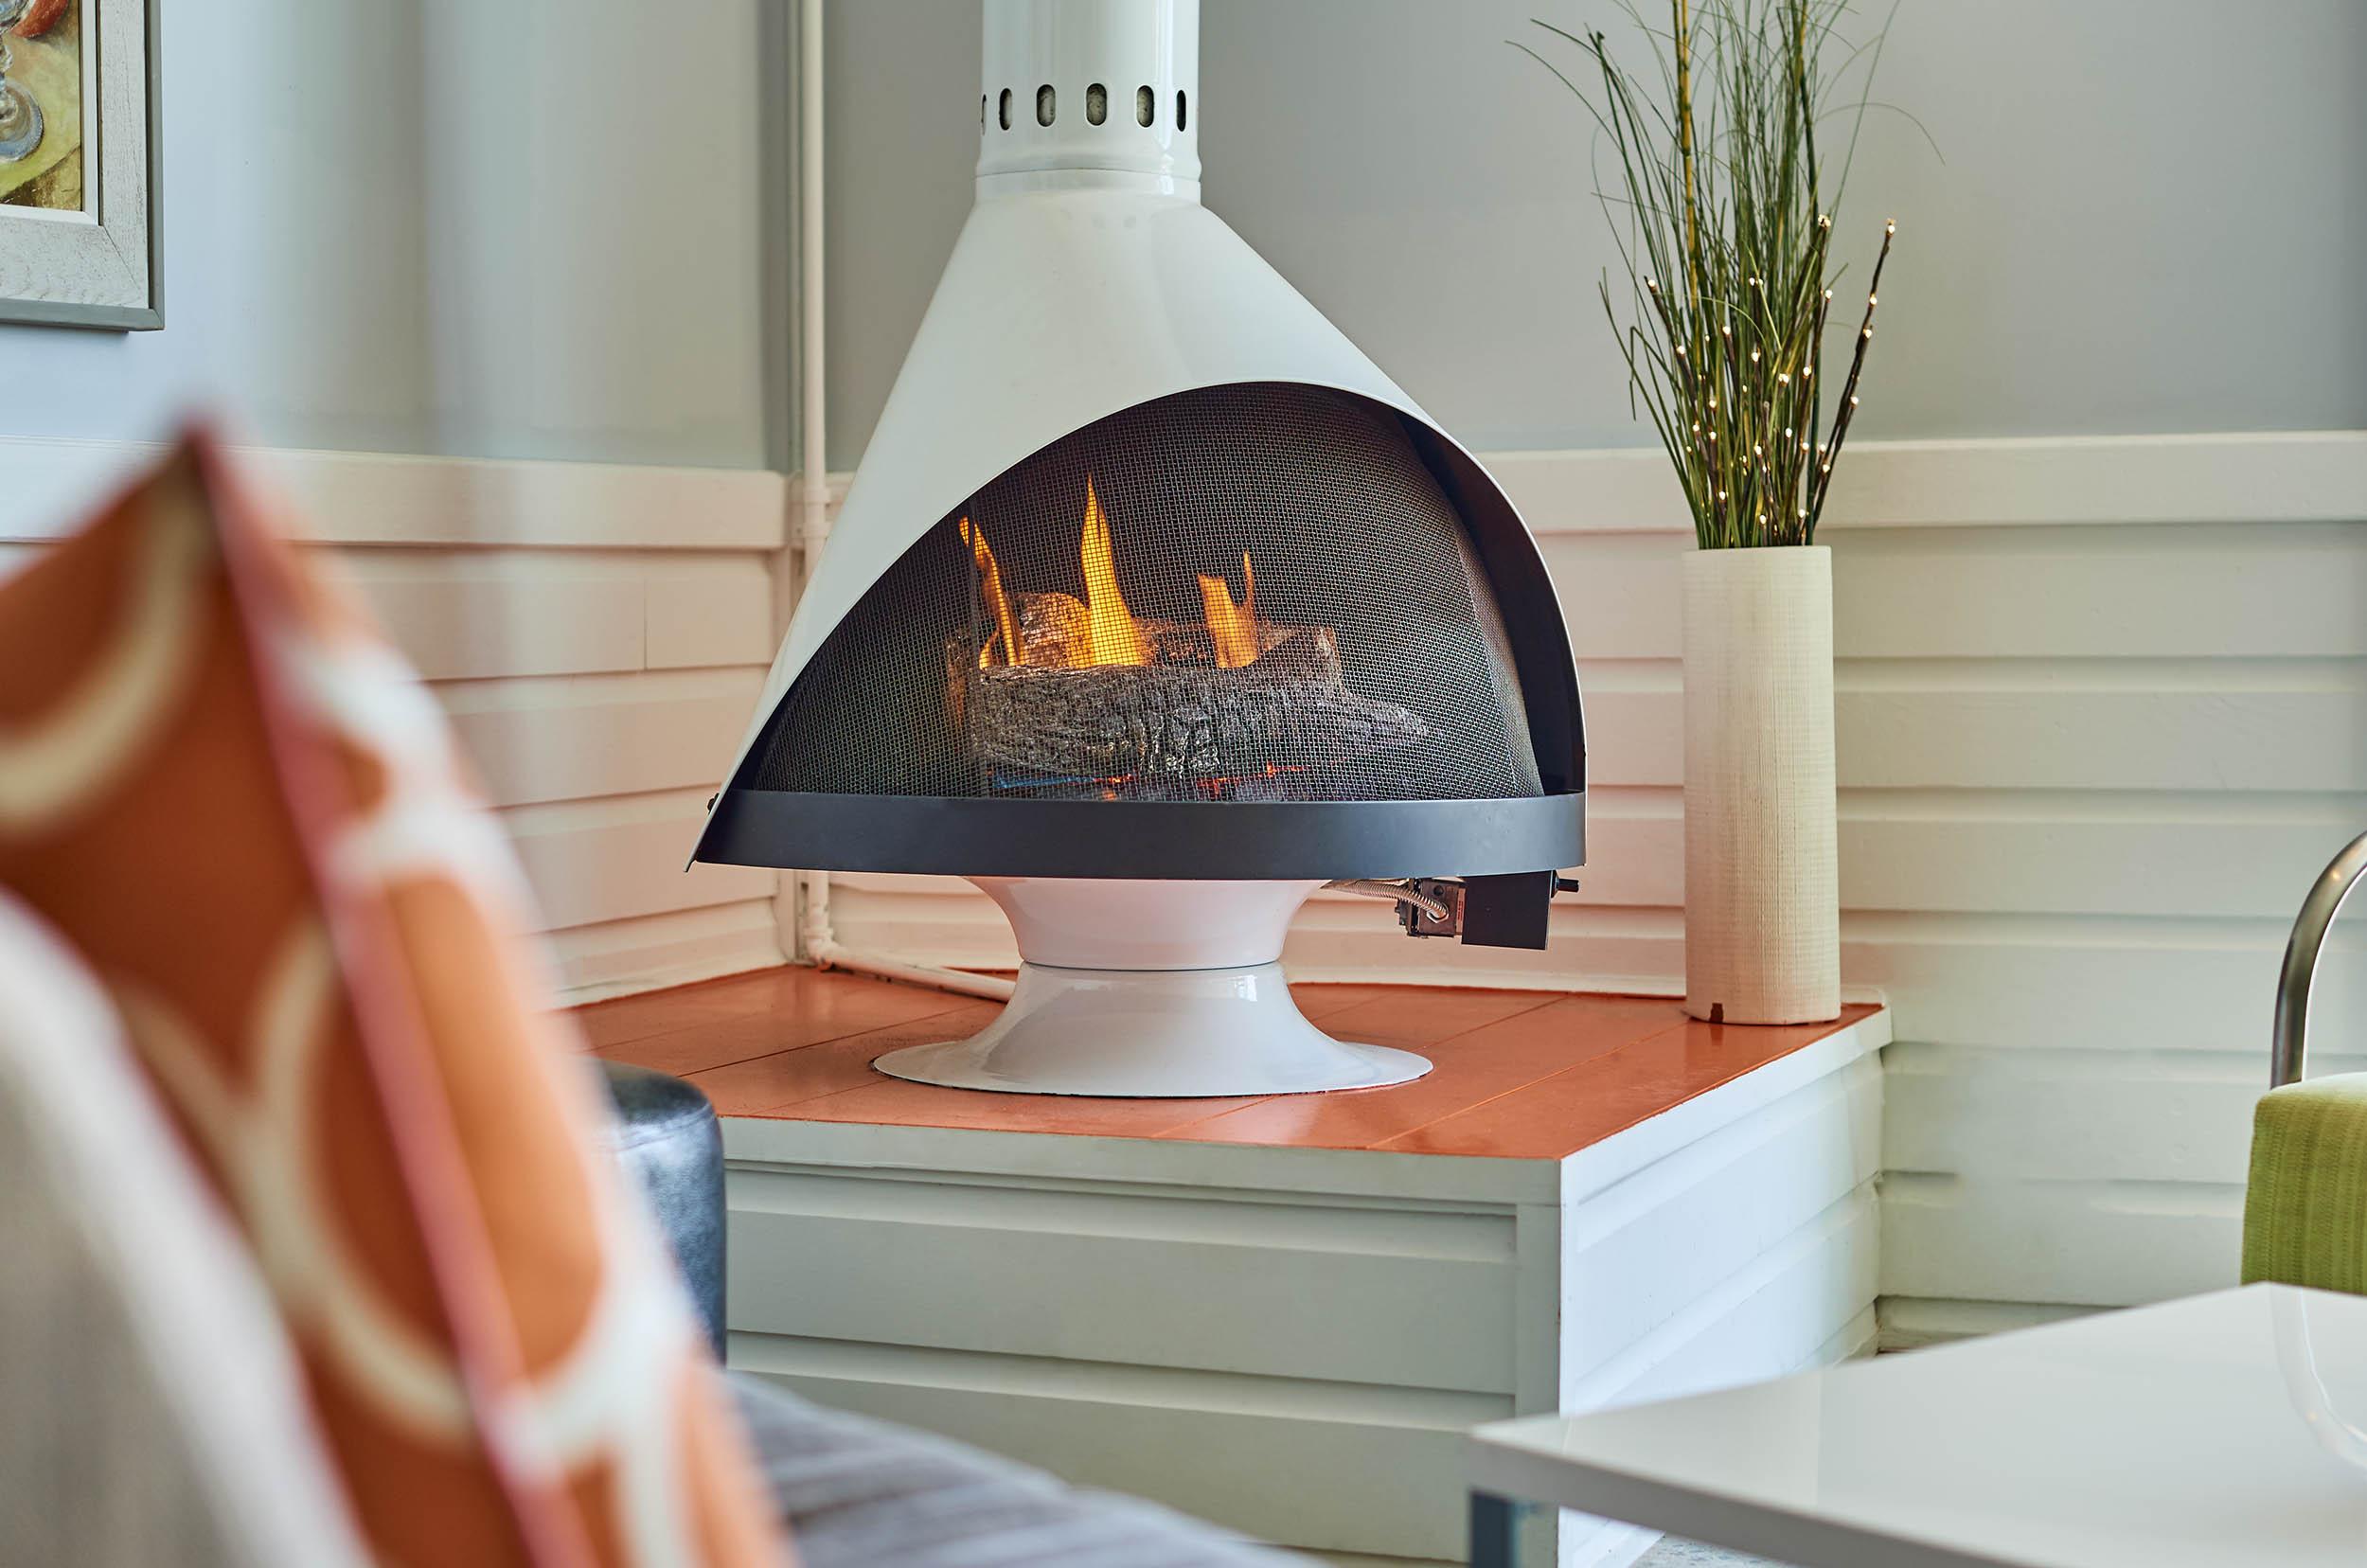 HH_detail_fireplace_160603_11144.jpg